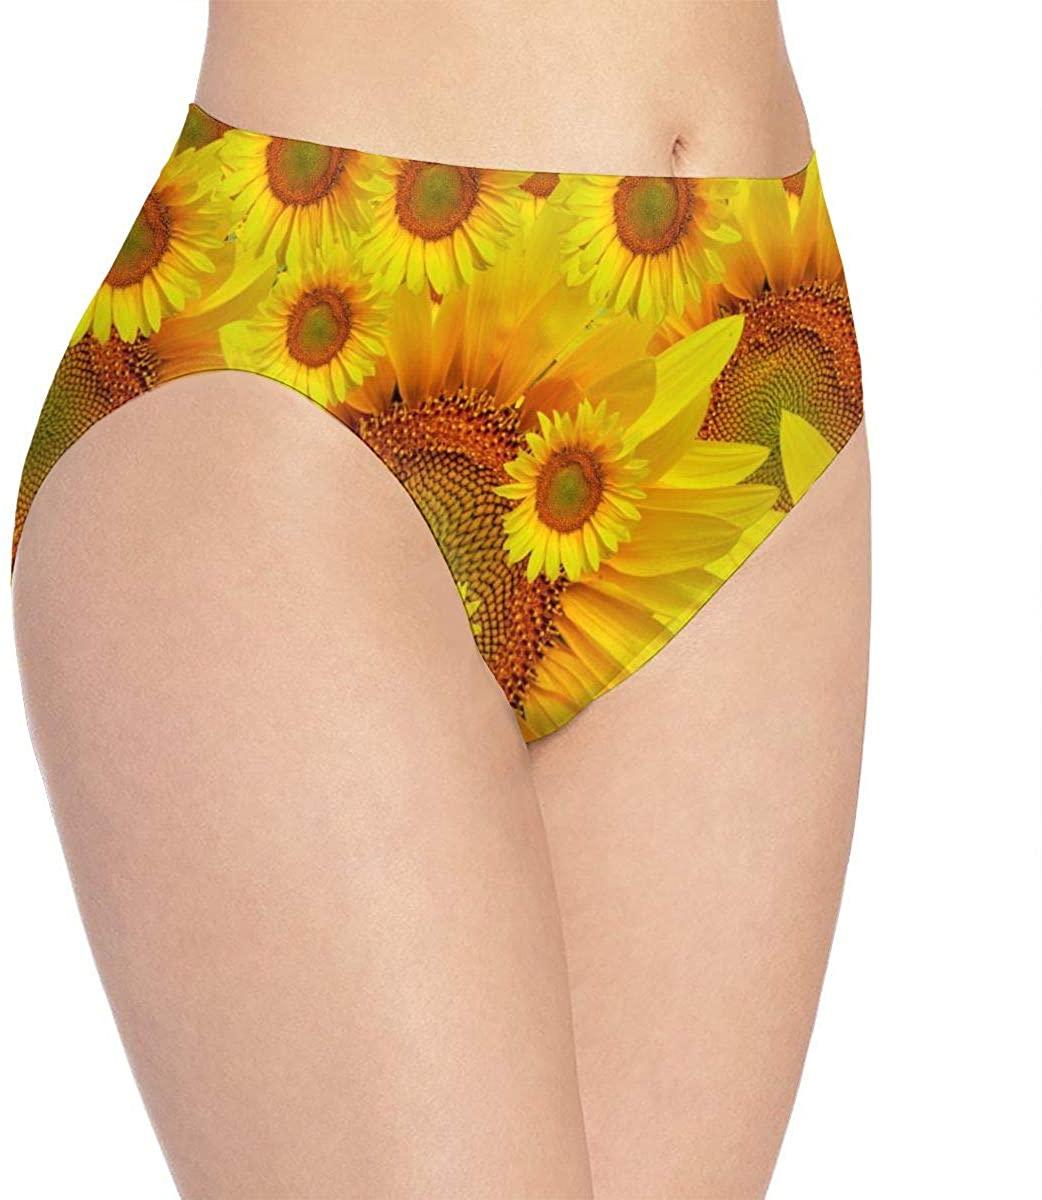 Womens Underwear Beautiful Landscape Sunshine Flower Floral Trendy Bikini Brief Hipster Panties Panty Ladies